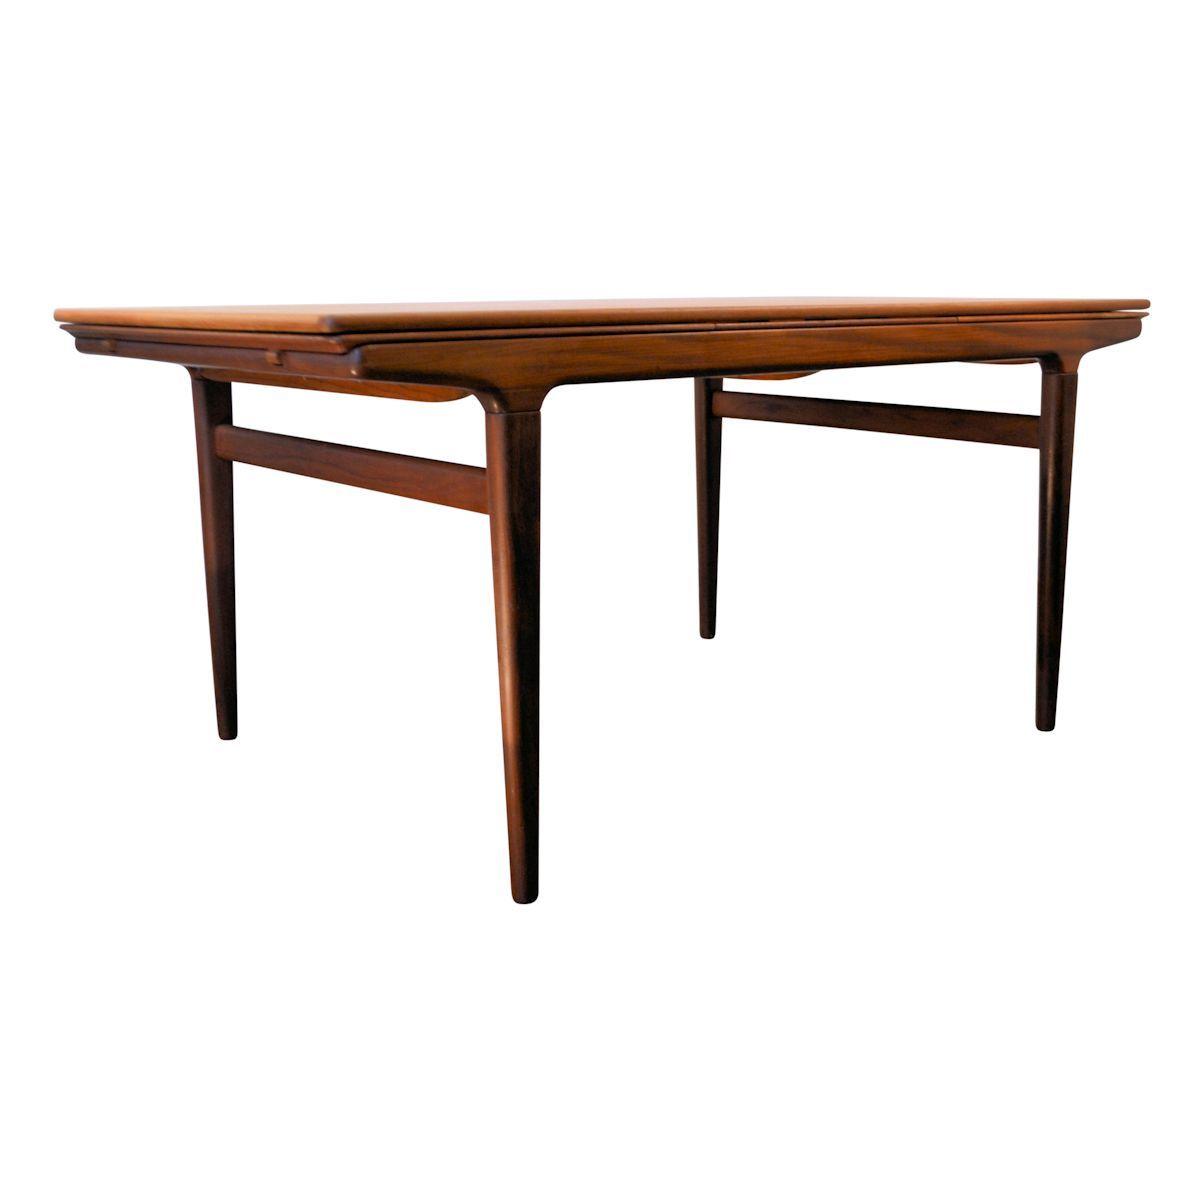 table de salle manger vintage extensible en teck par johannes andersen pour uldum m belfabrik. Black Bedroom Furniture Sets. Home Design Ideas